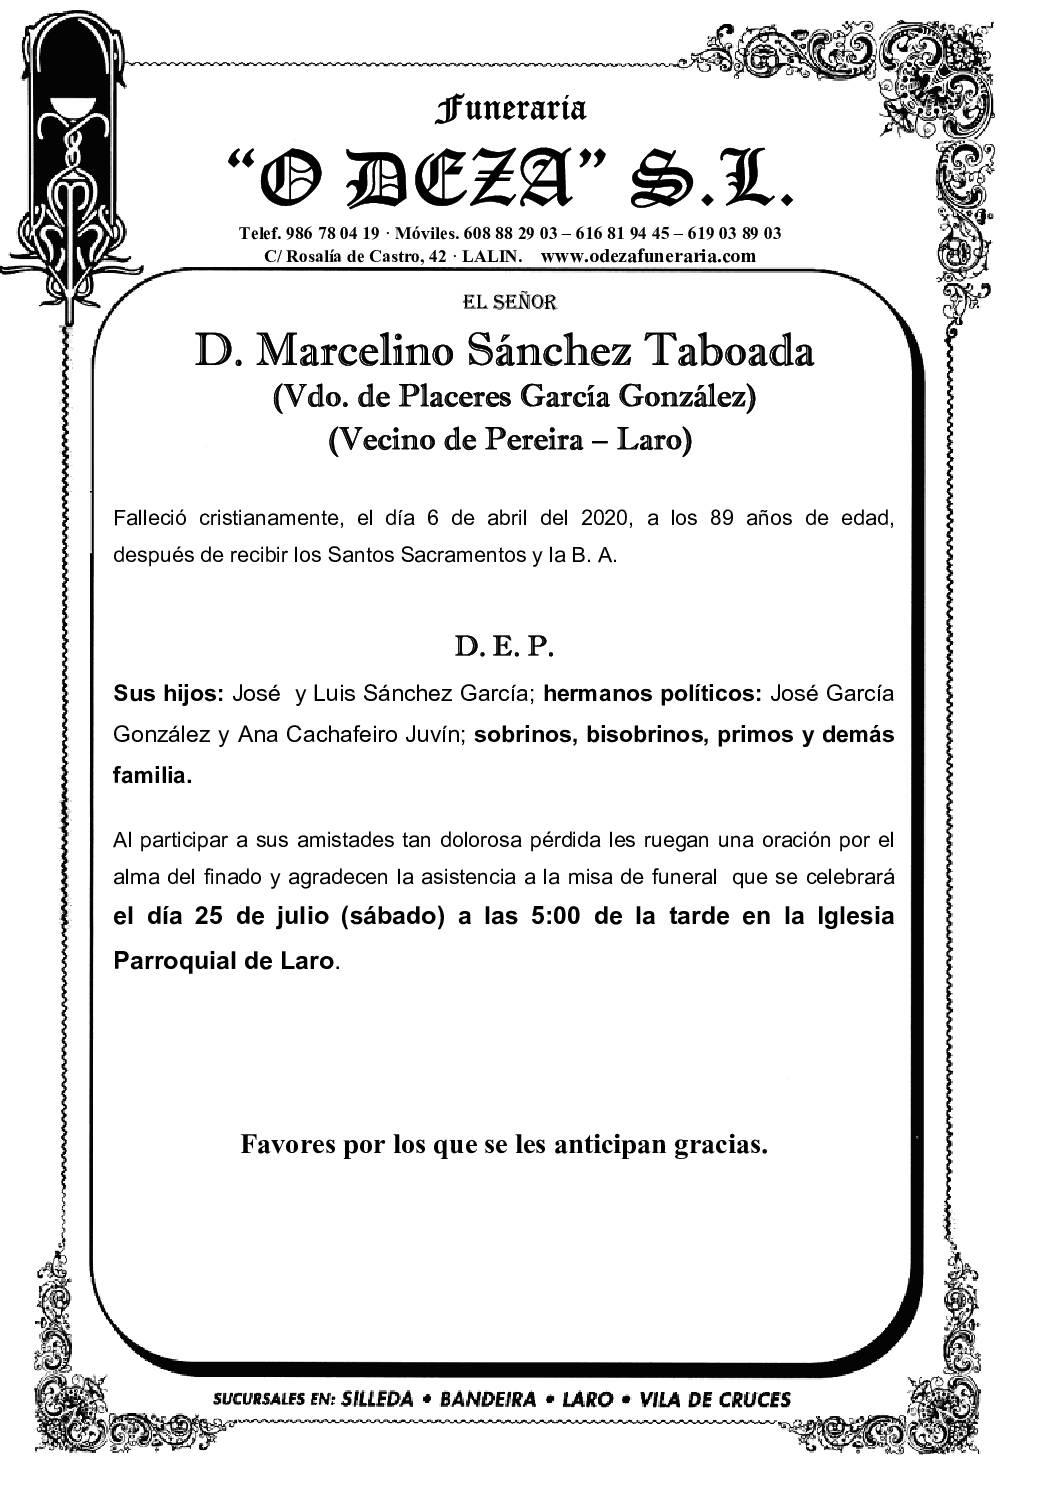 D. MARCELINO SÁNCHEZ TABOADA